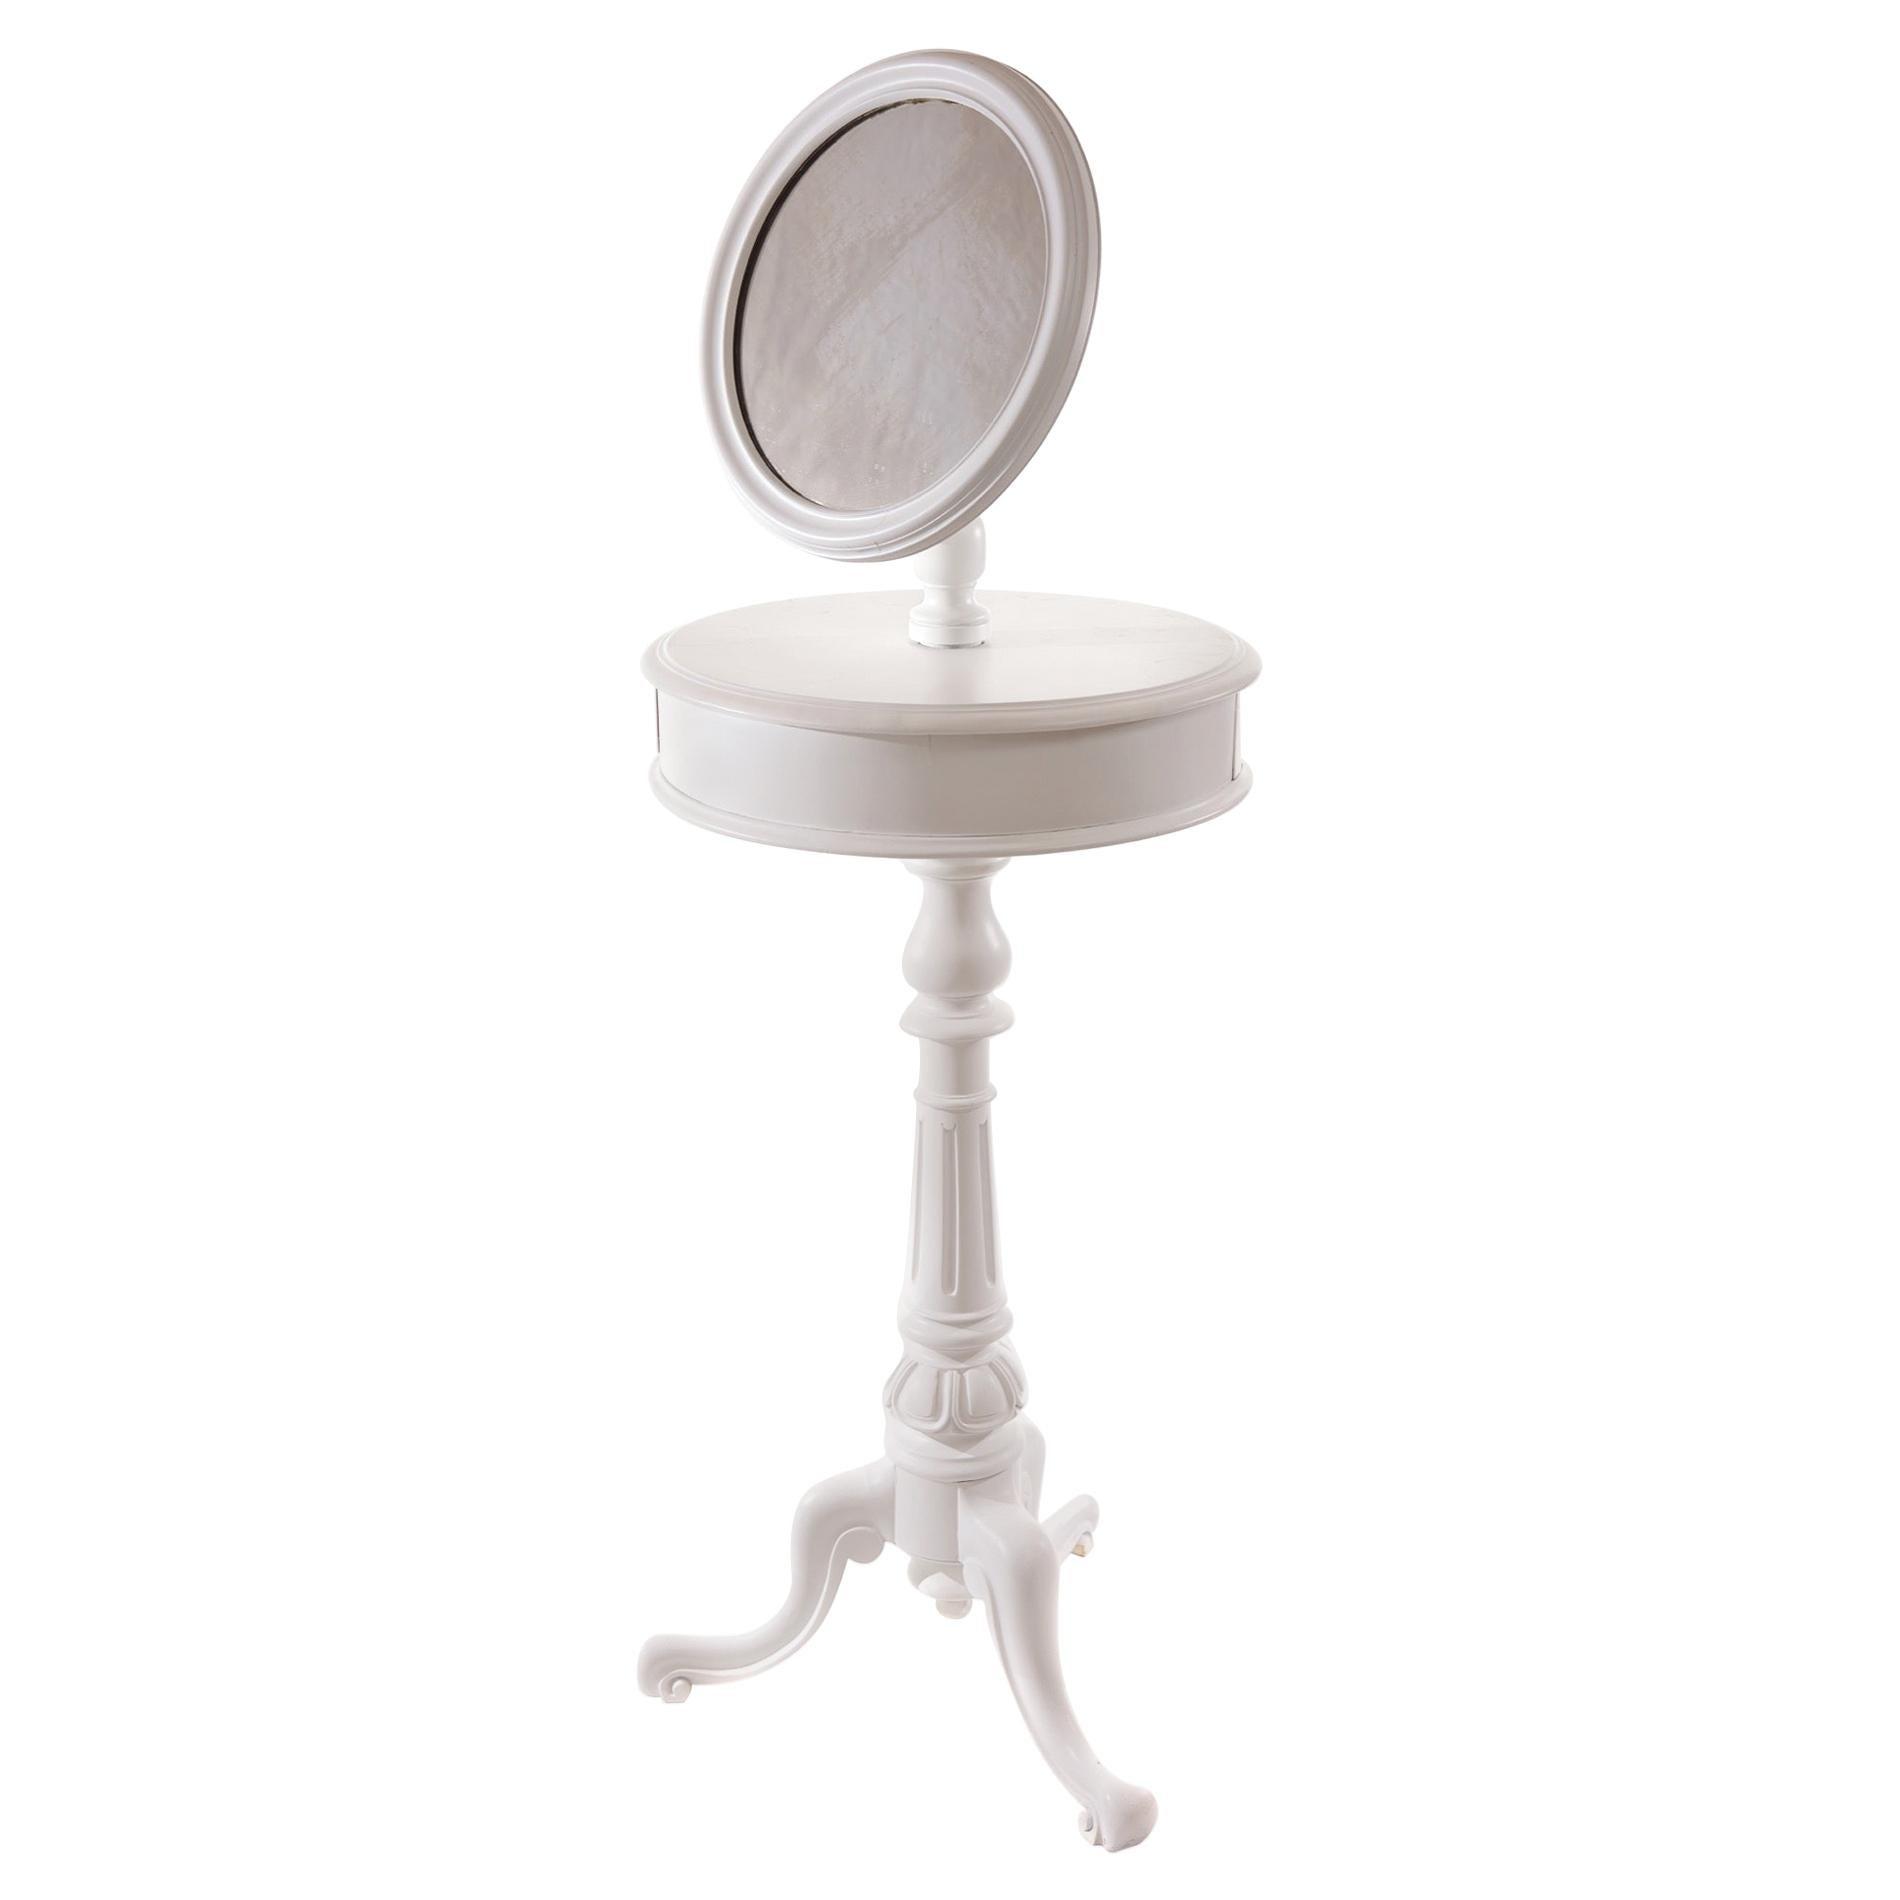 Victorian 19th Century Painted Adjustable Shaving Mirror, circa 1860